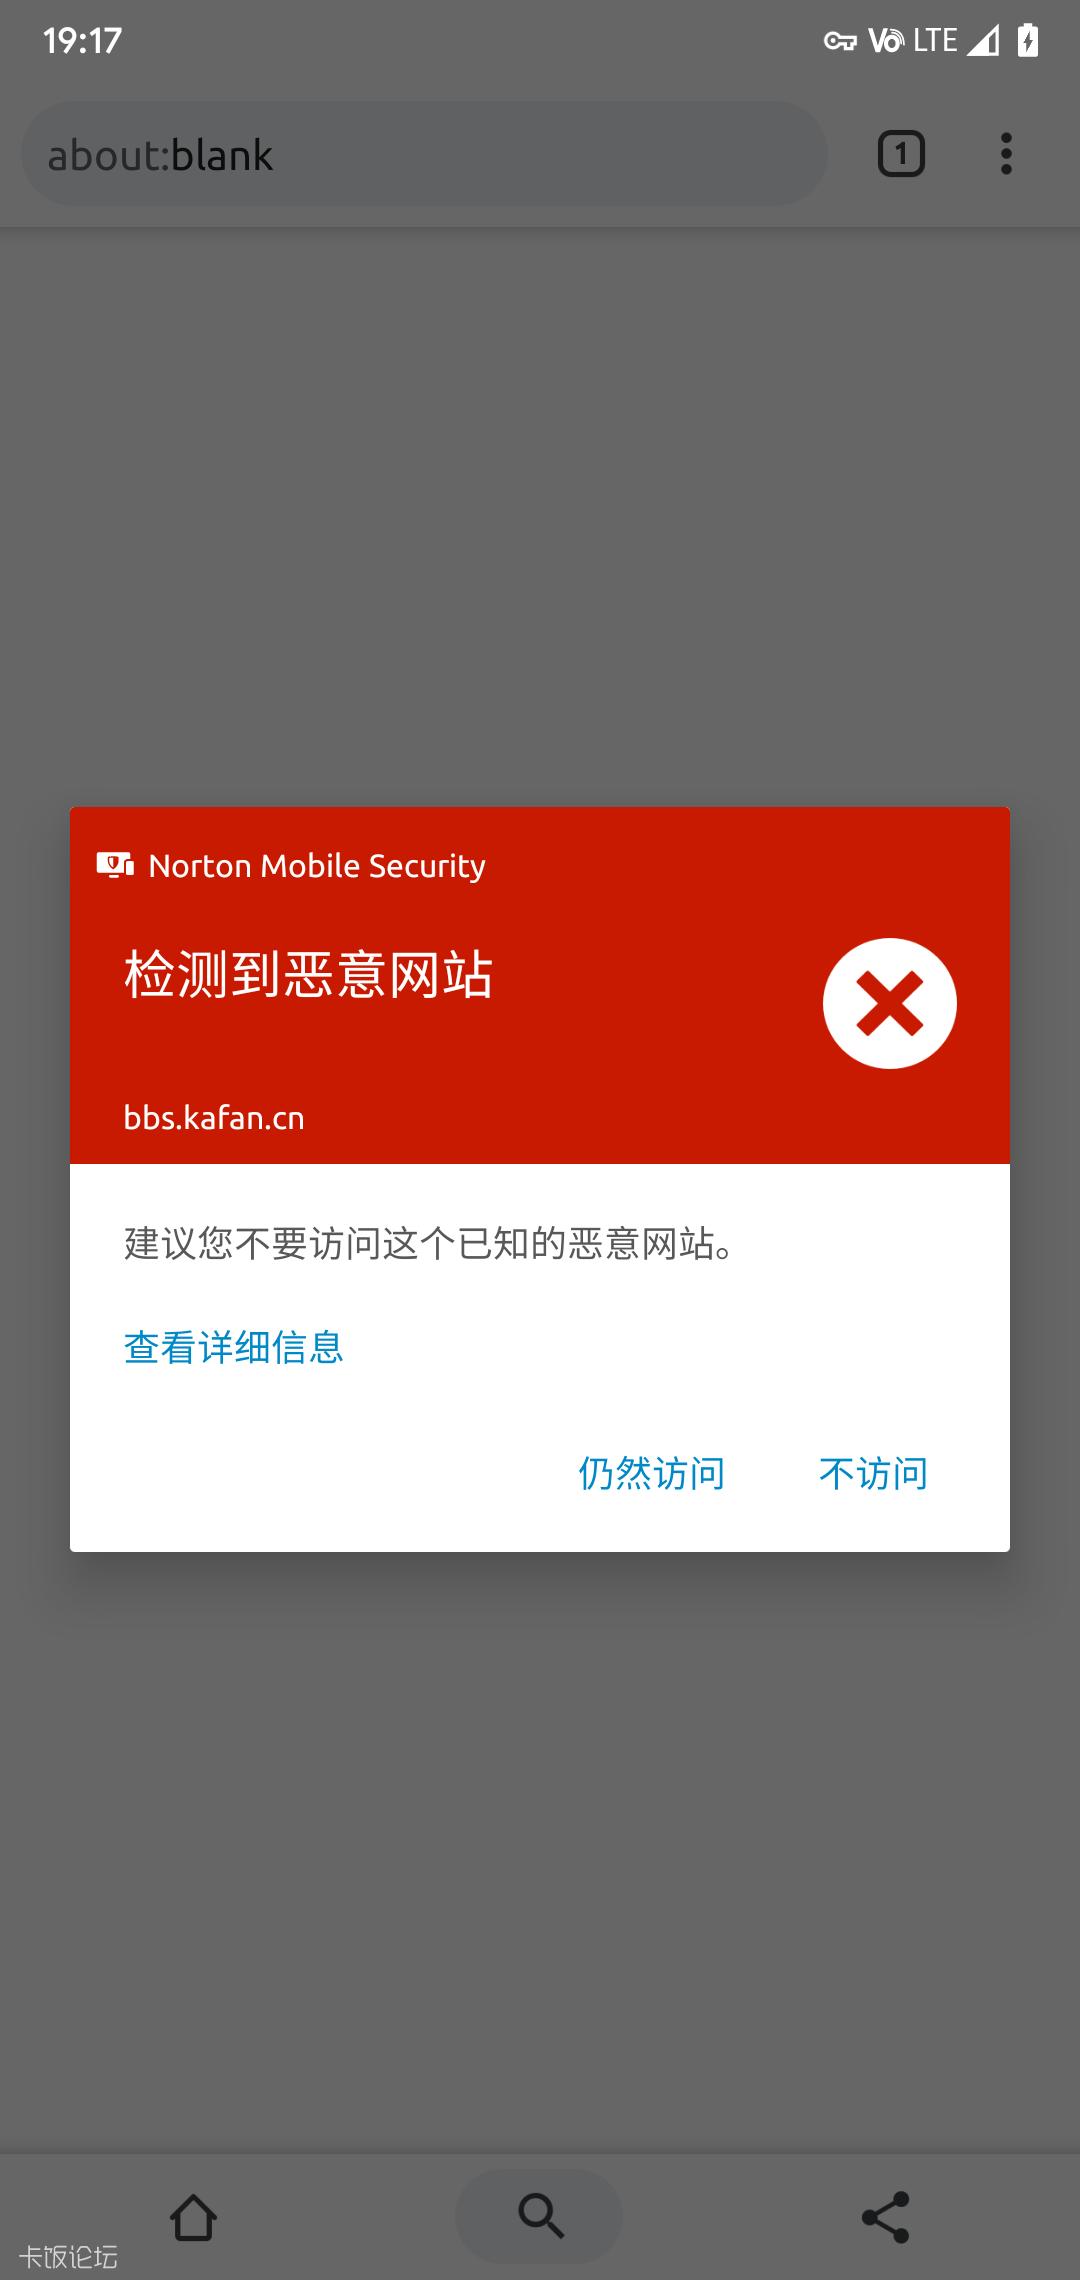 Screenshot_Norton_Mobile_Security_20200226-191725.png